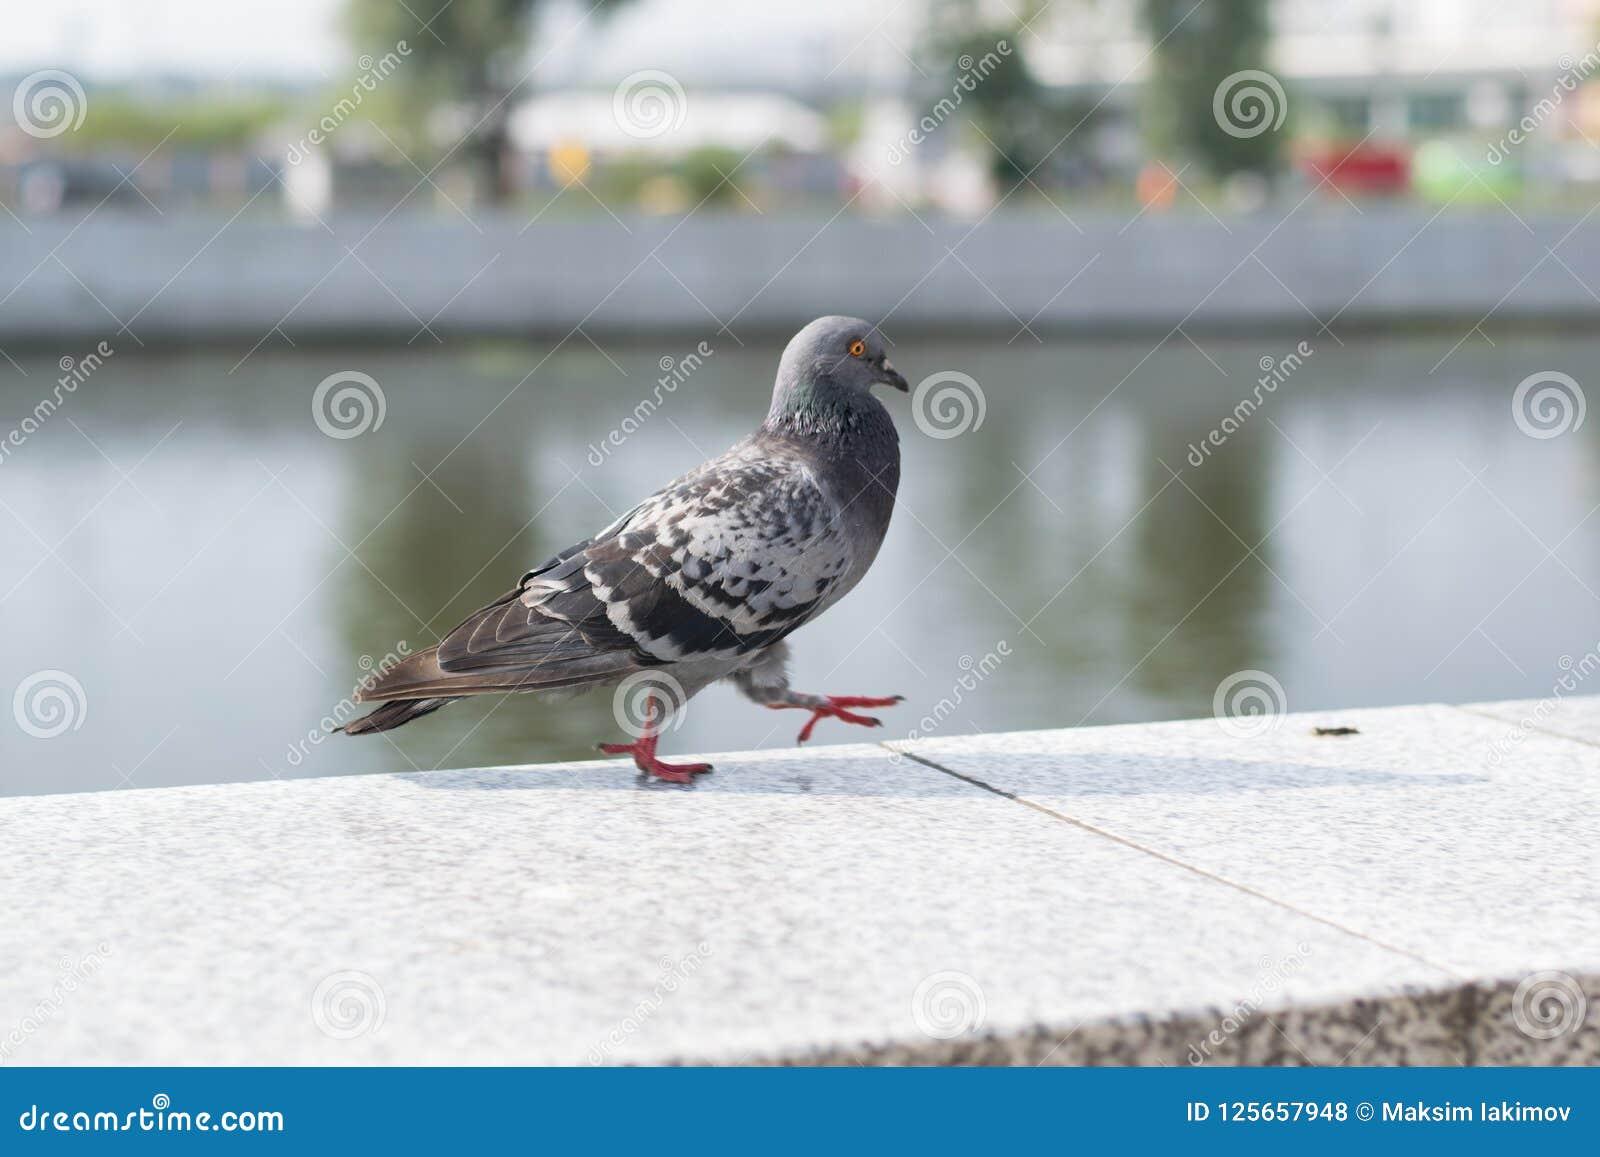 Pigeon walk in the street.